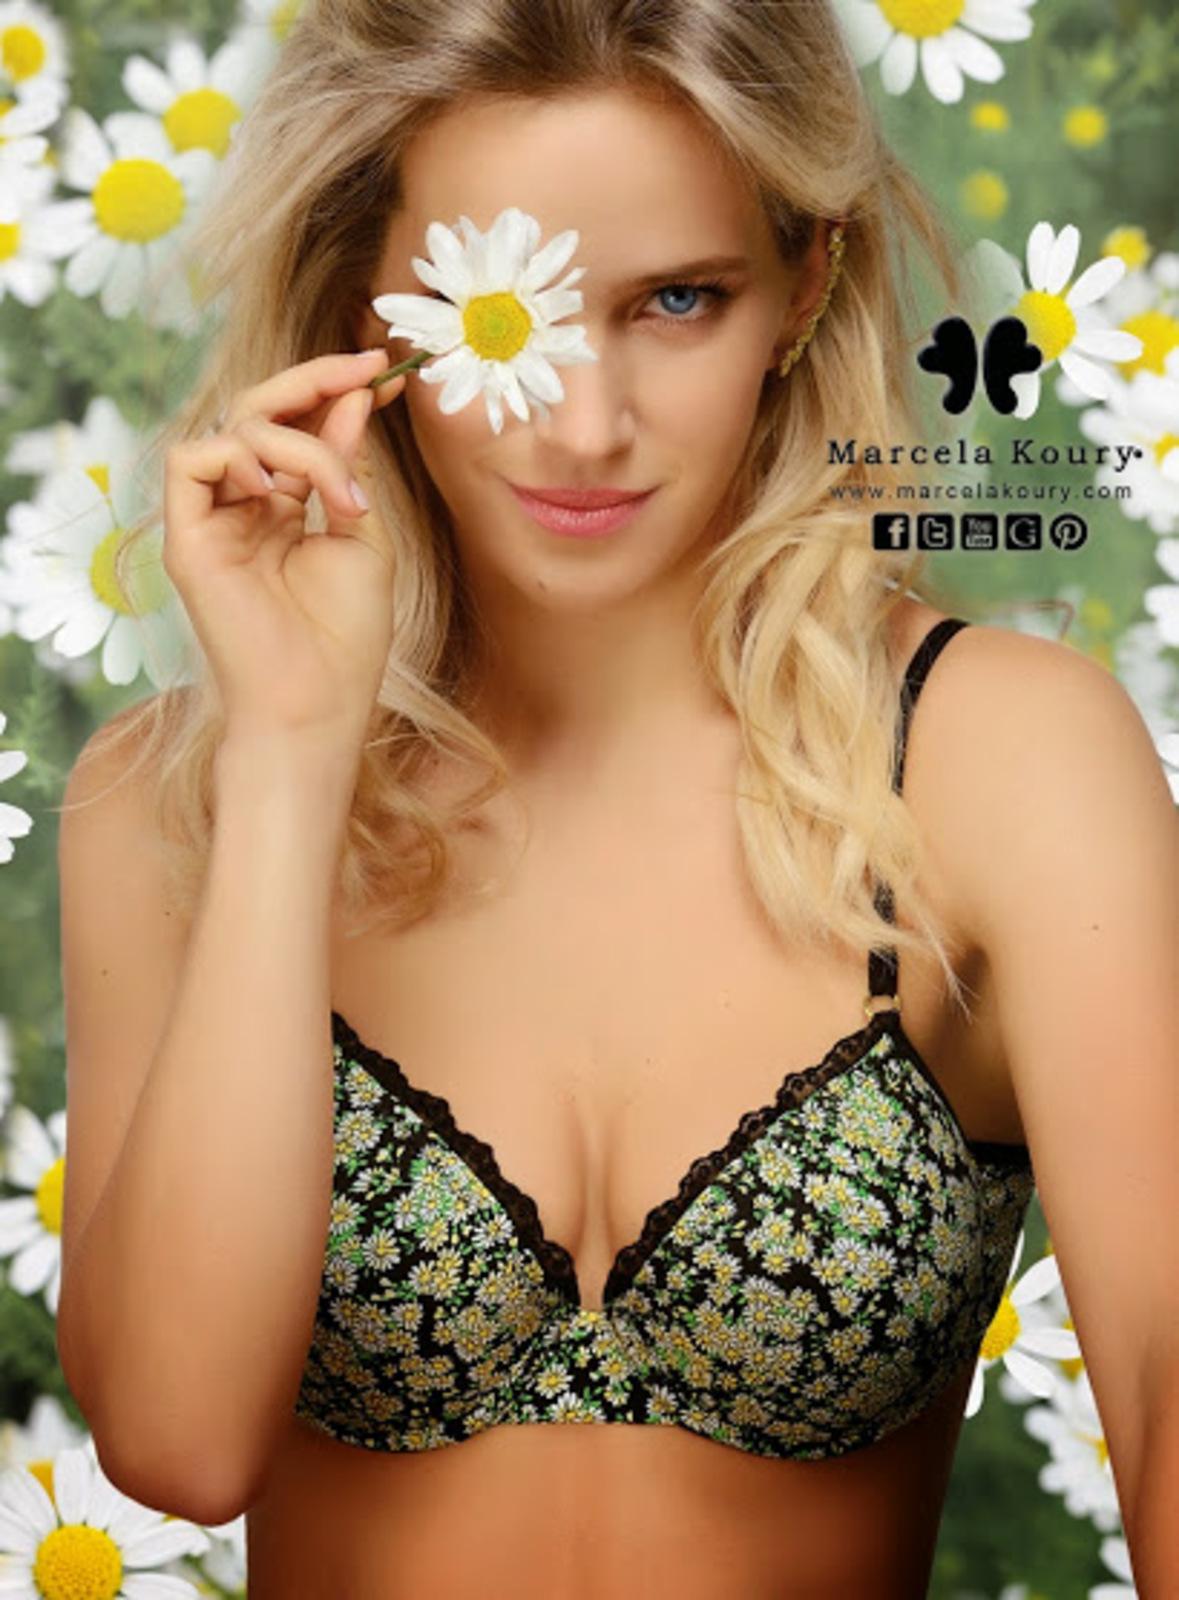 Luisana lopilato / ლუიზიანა ლოპილატო - Page 6 2014_15_mk_primavera_001